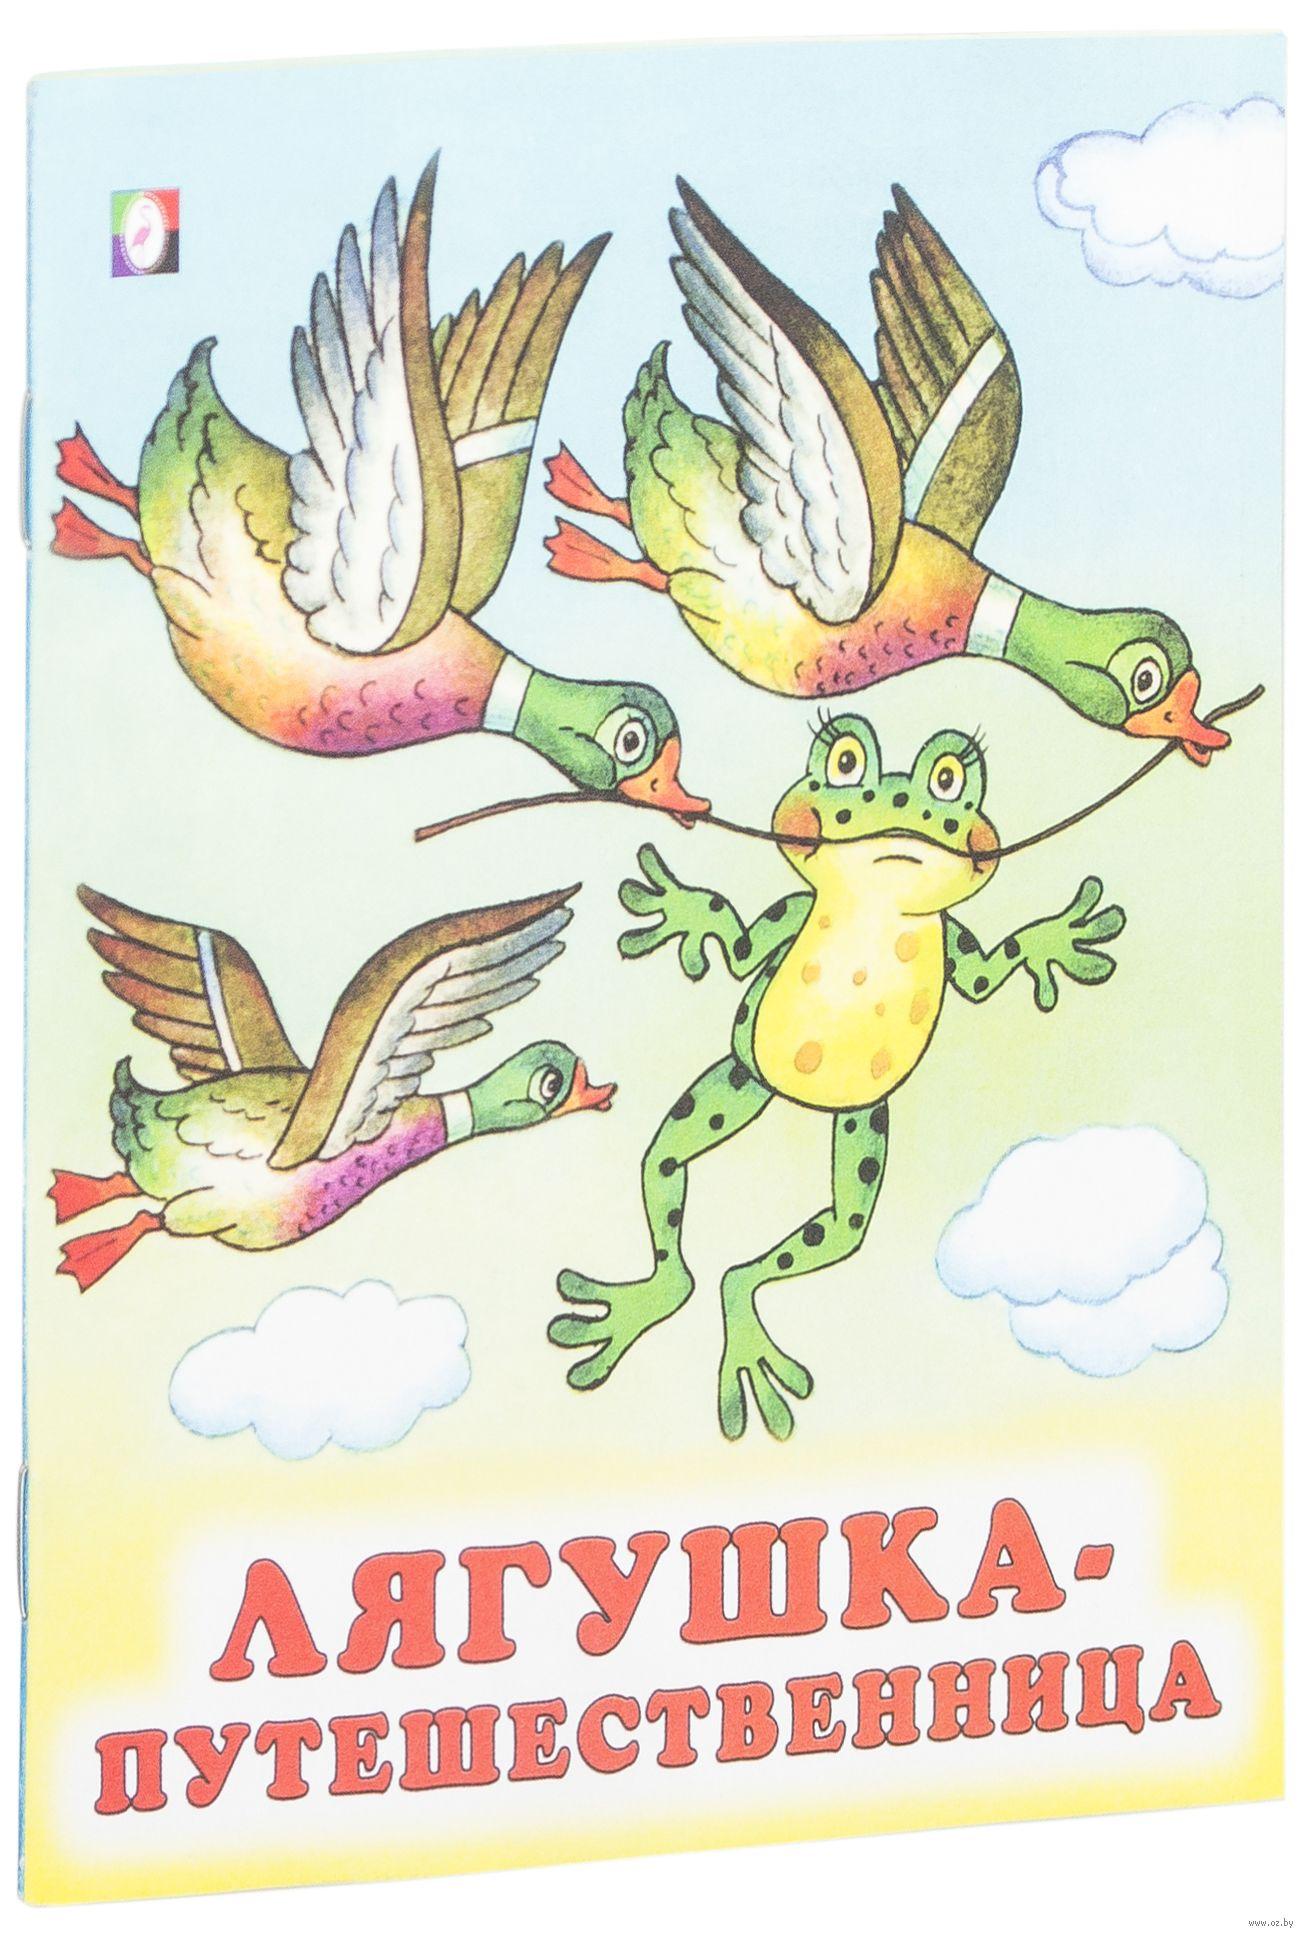 Кабанчиками, лягушка путешественница открытка